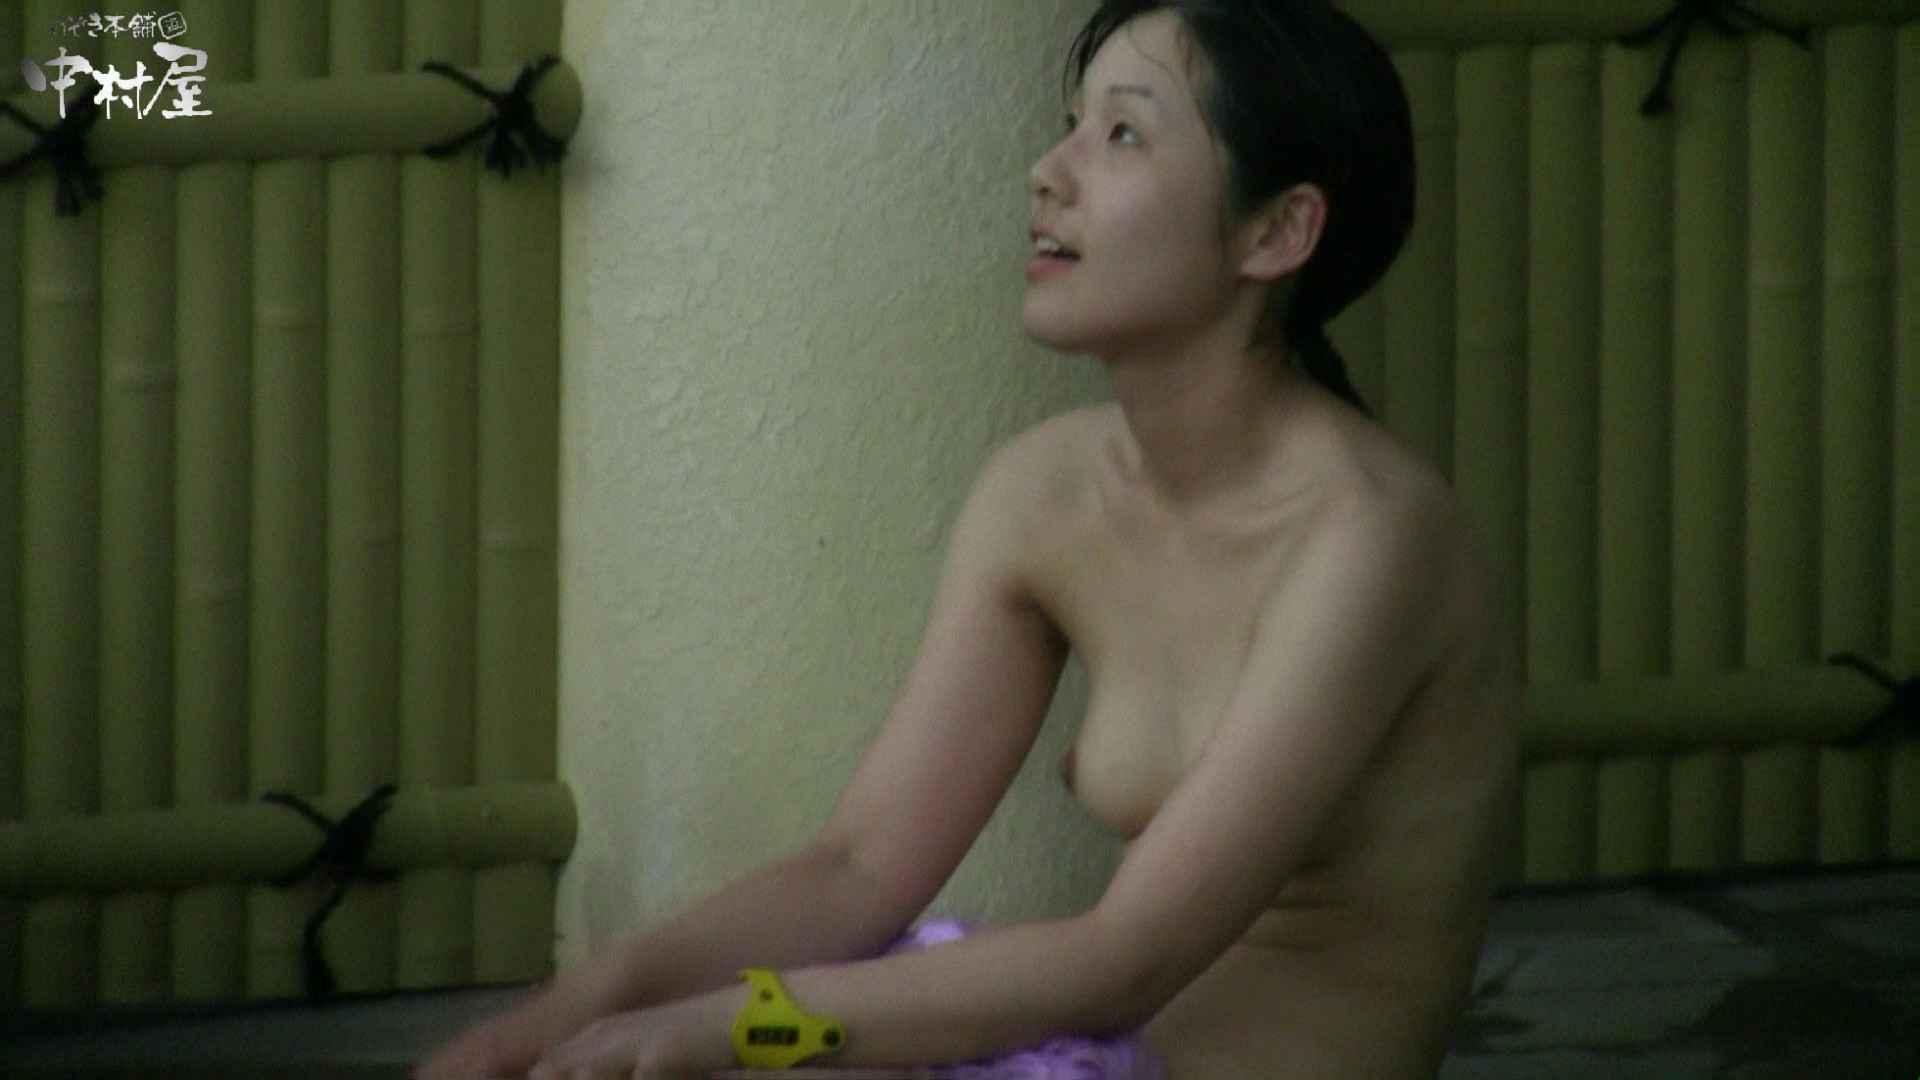 Aquaな露天風呂Vol.983 盗撮  23pic 9